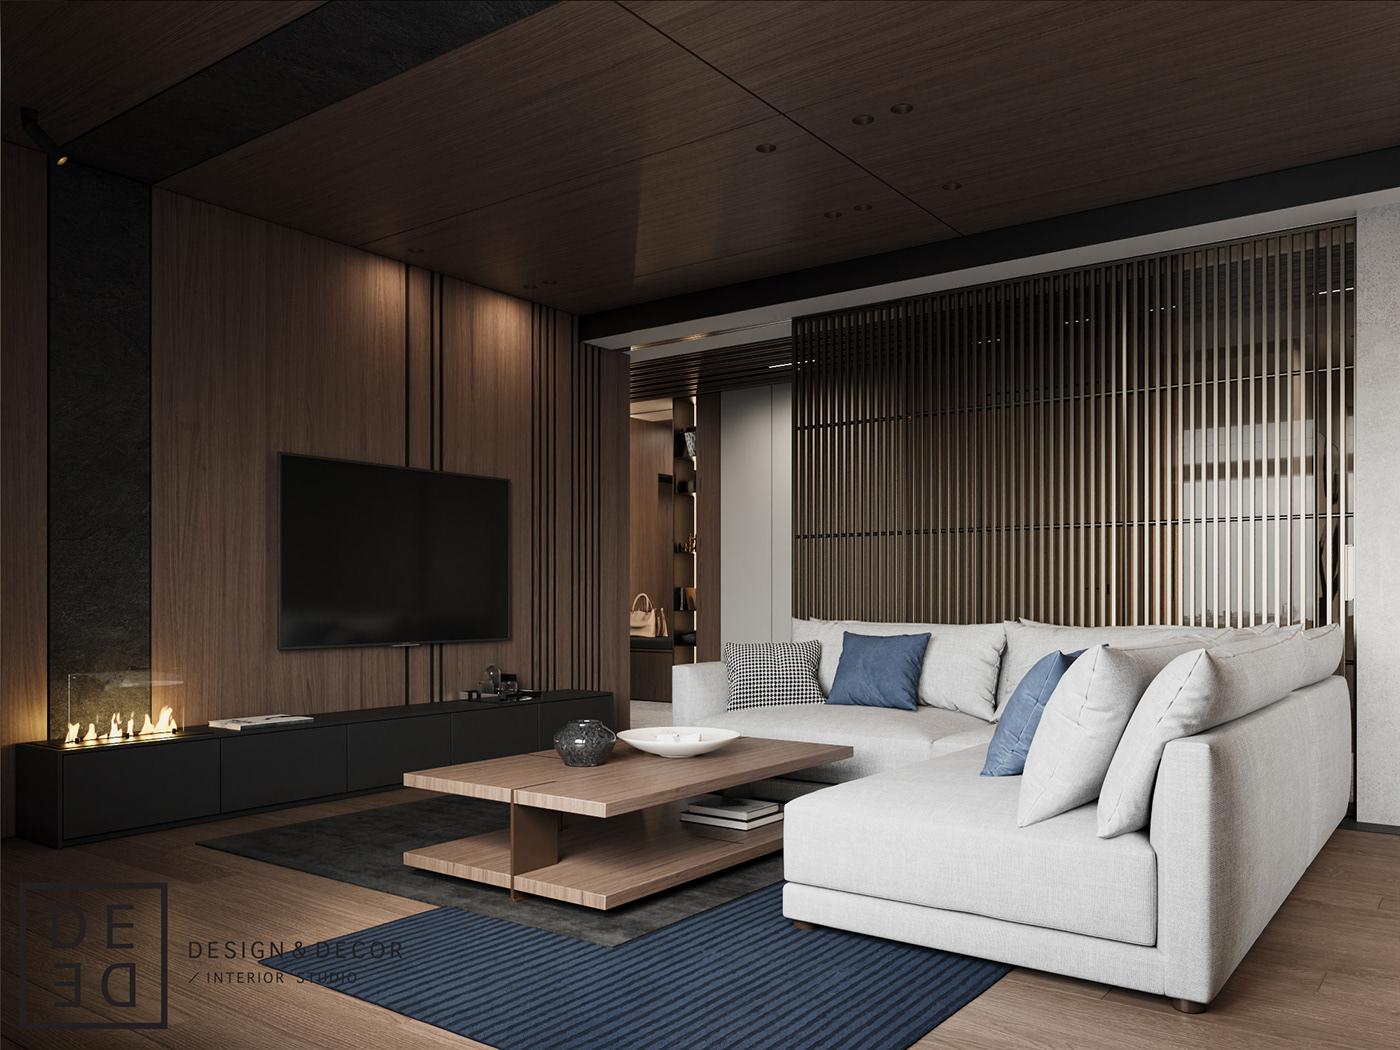 Interior design interiordesign architecture Minimalism modern architecture design DE&DE Interior Studio corona render  photoshop